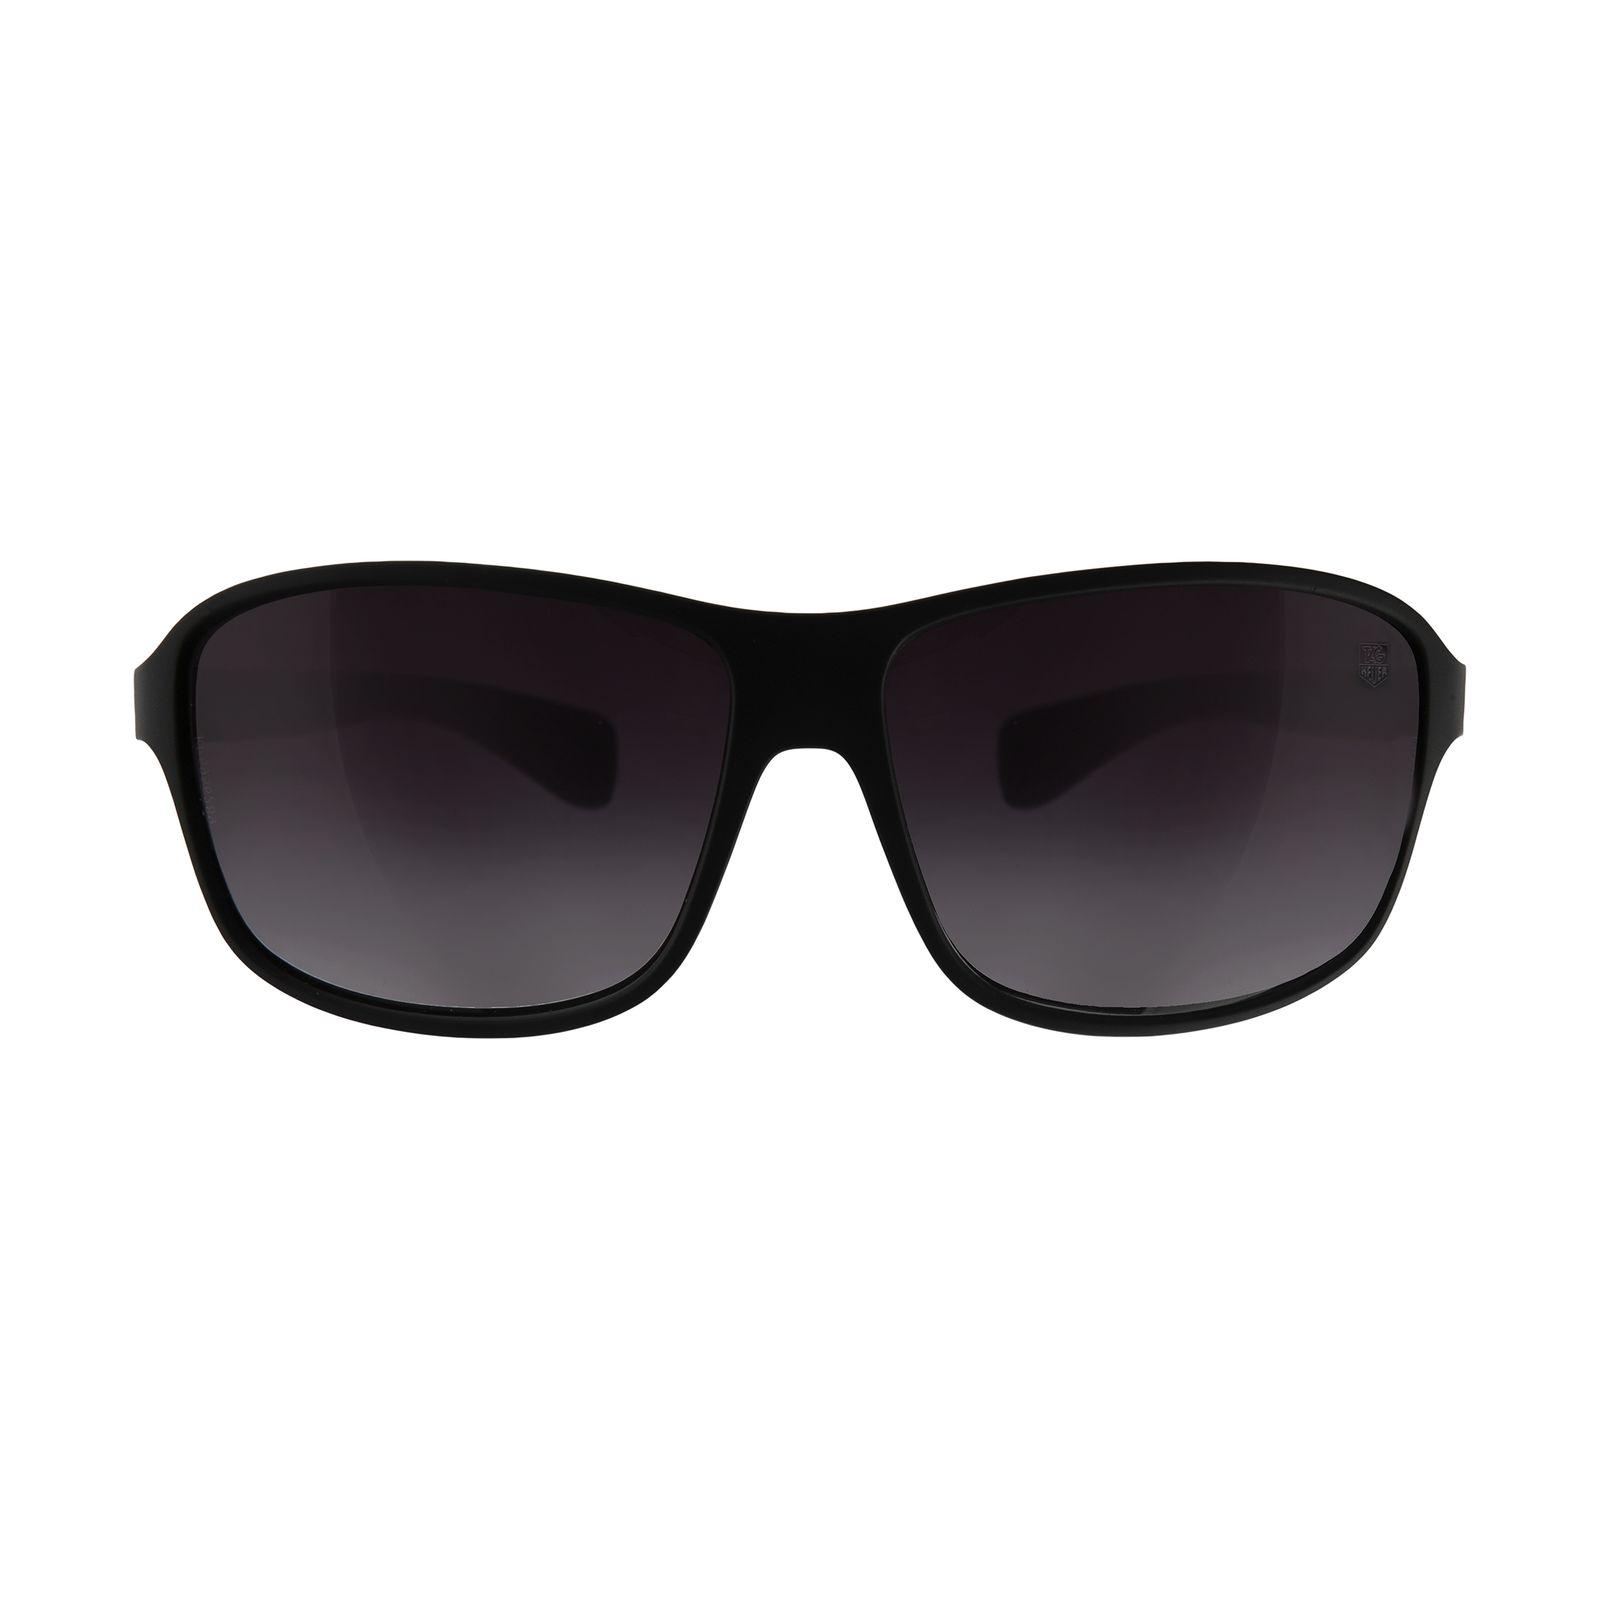 عینک آفتابی تگ هویر مدل 9302 -  - 2